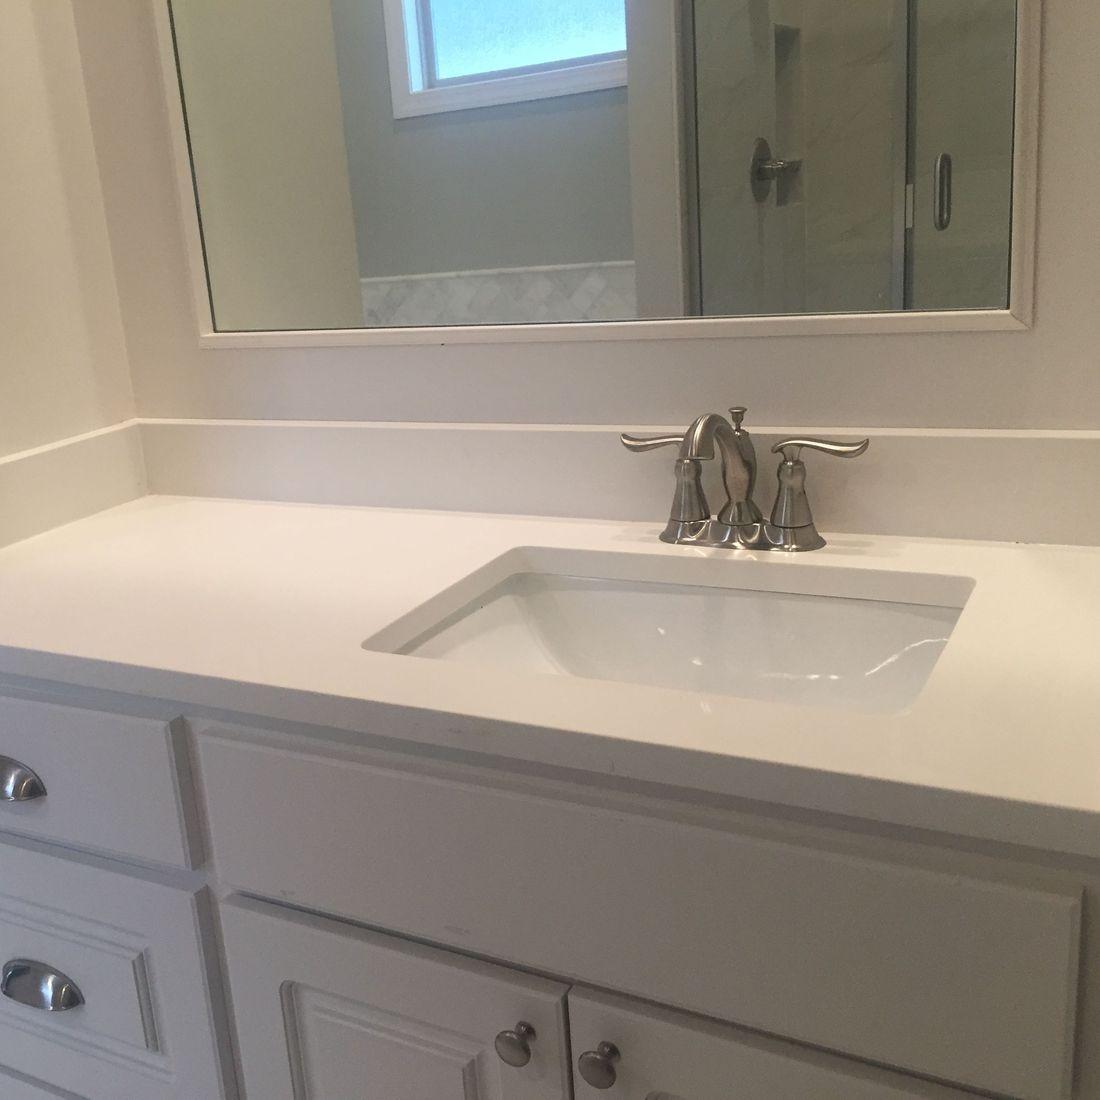 White bathroom sink countertop